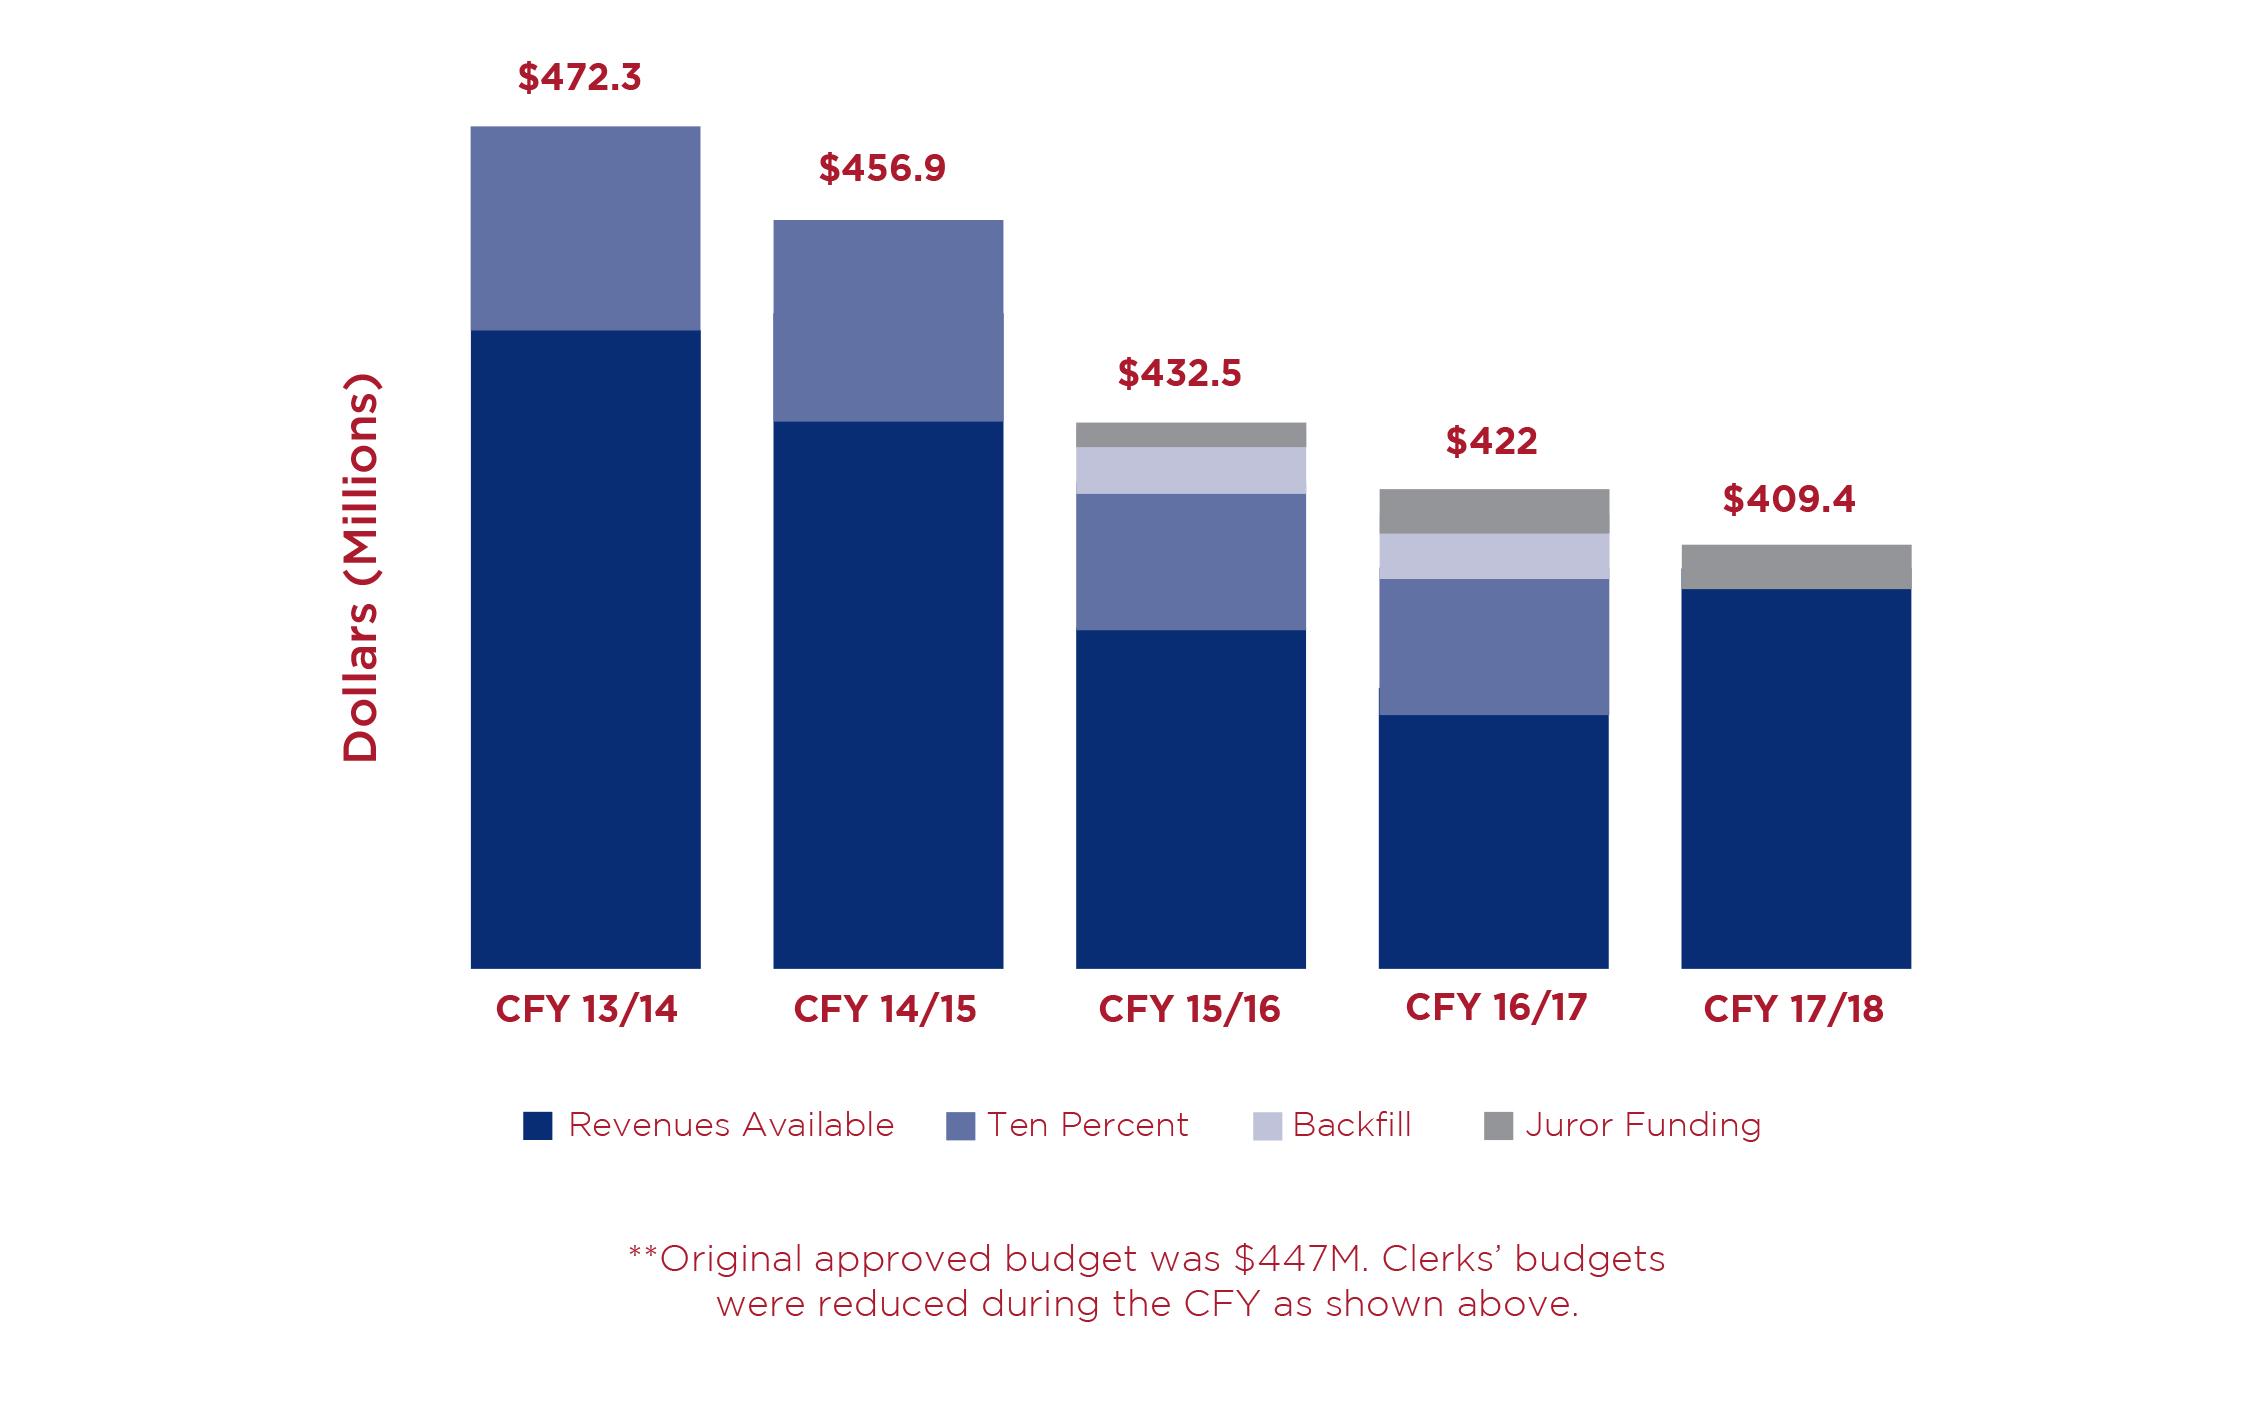 Historical Budget Information